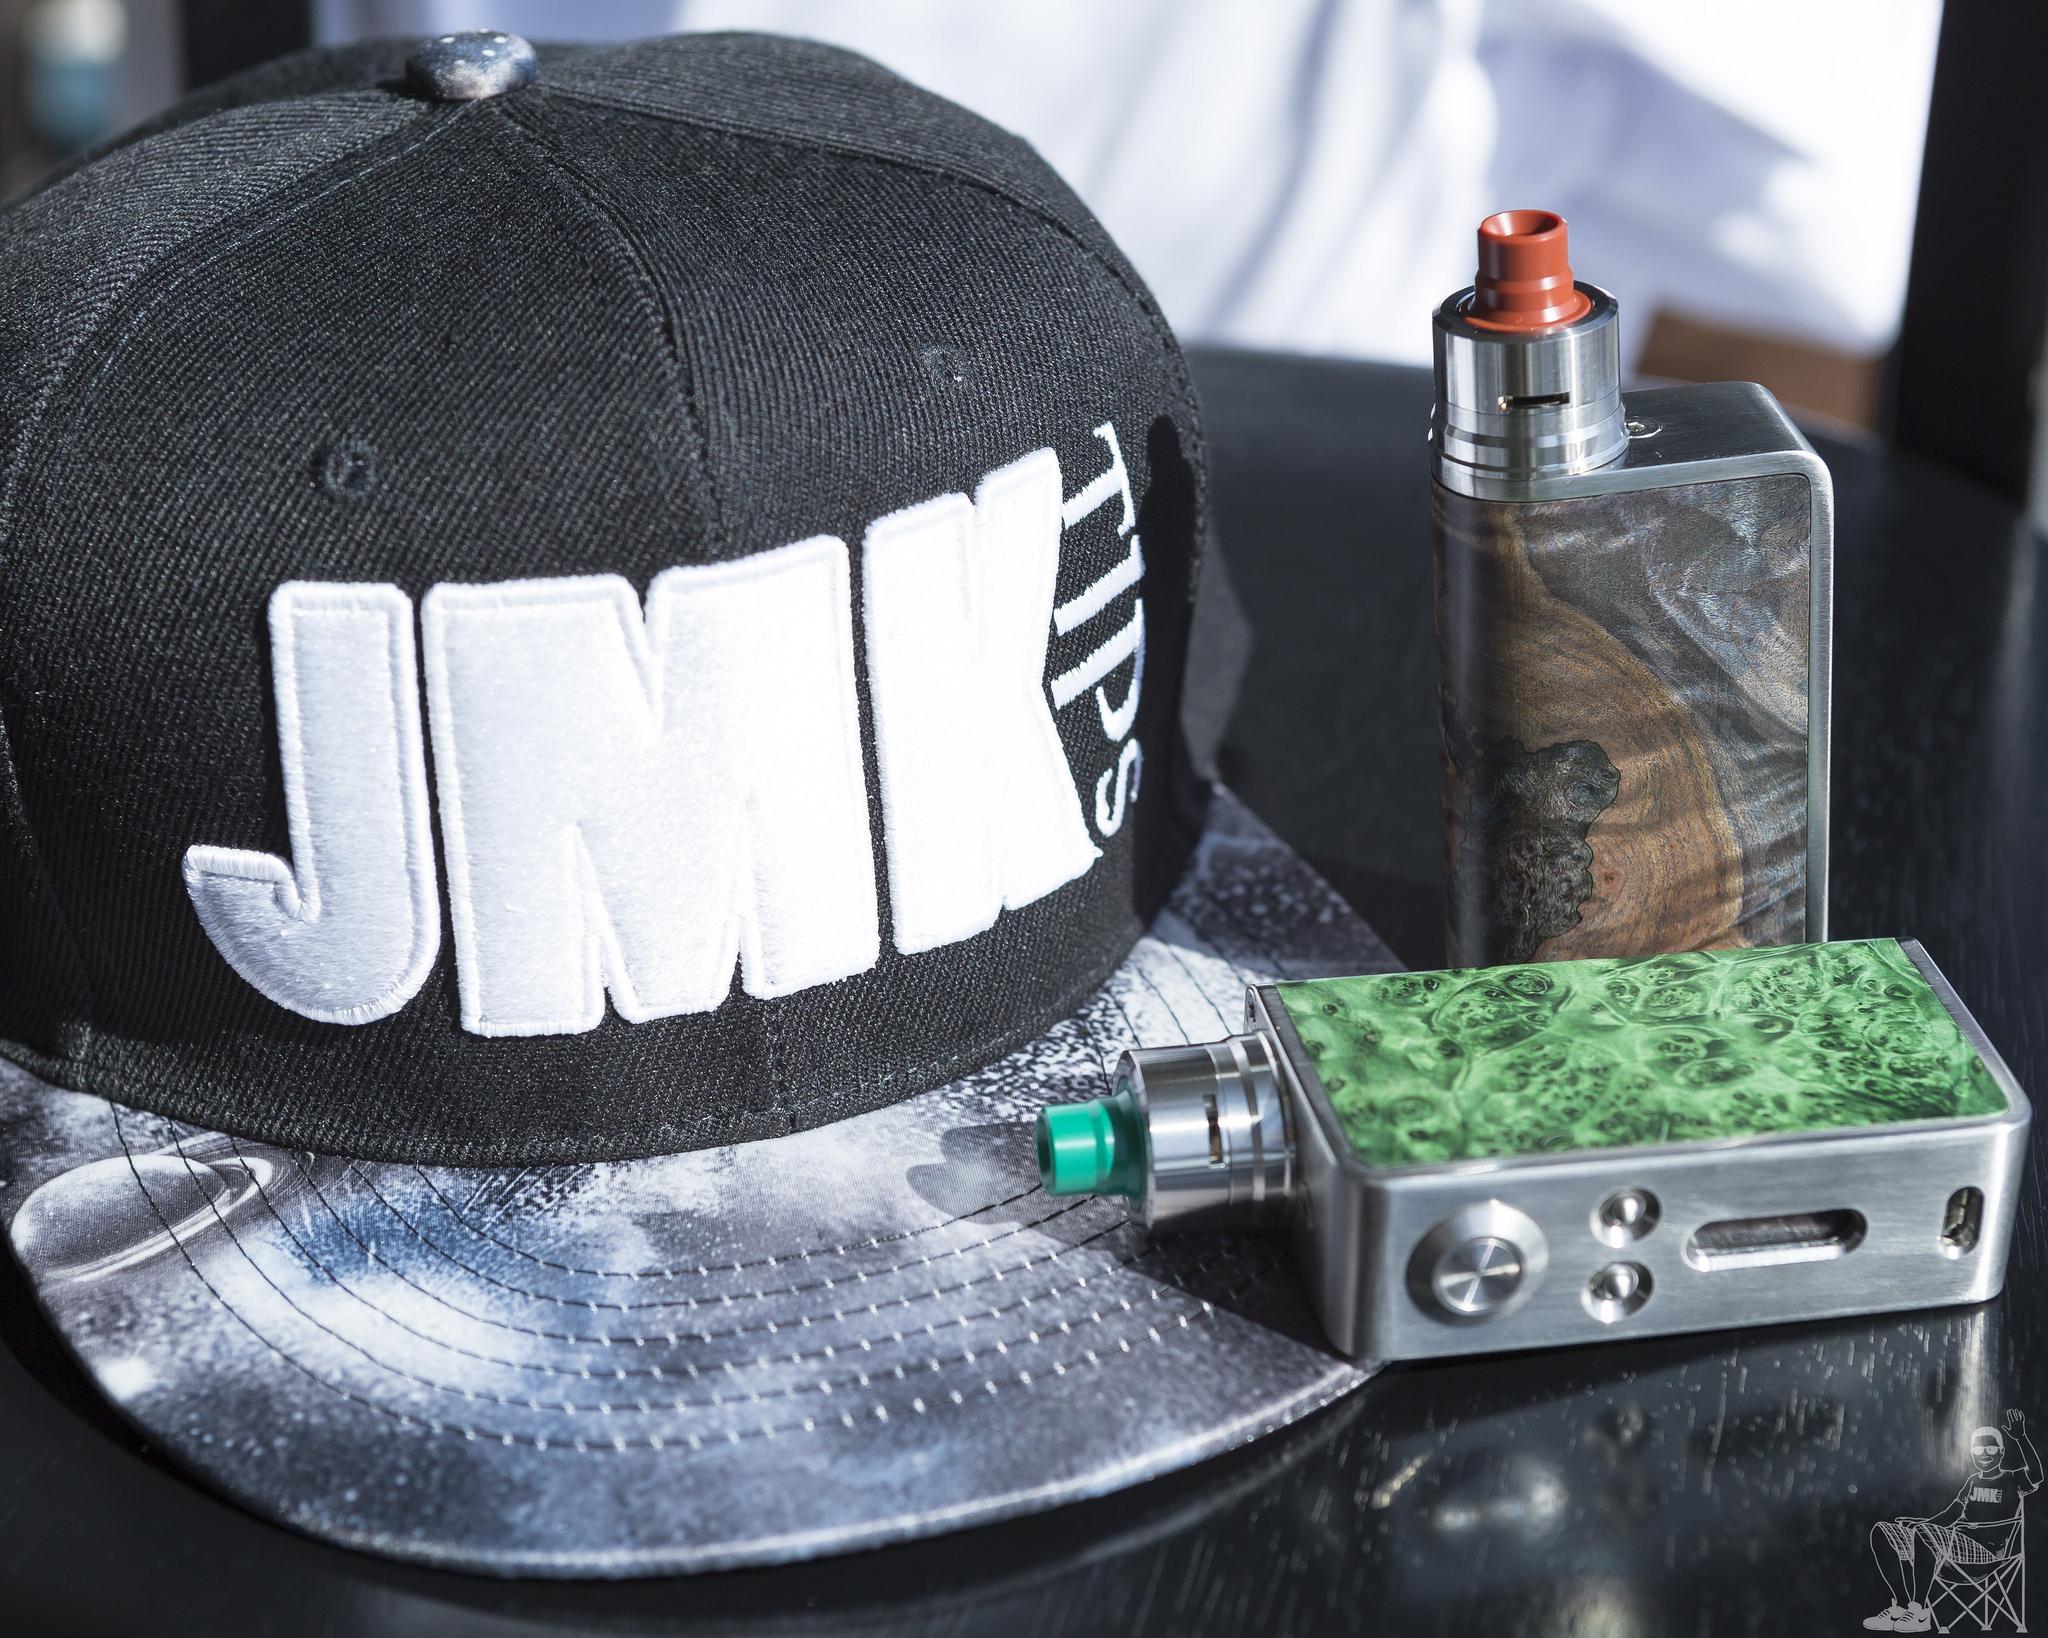 JMK Tips